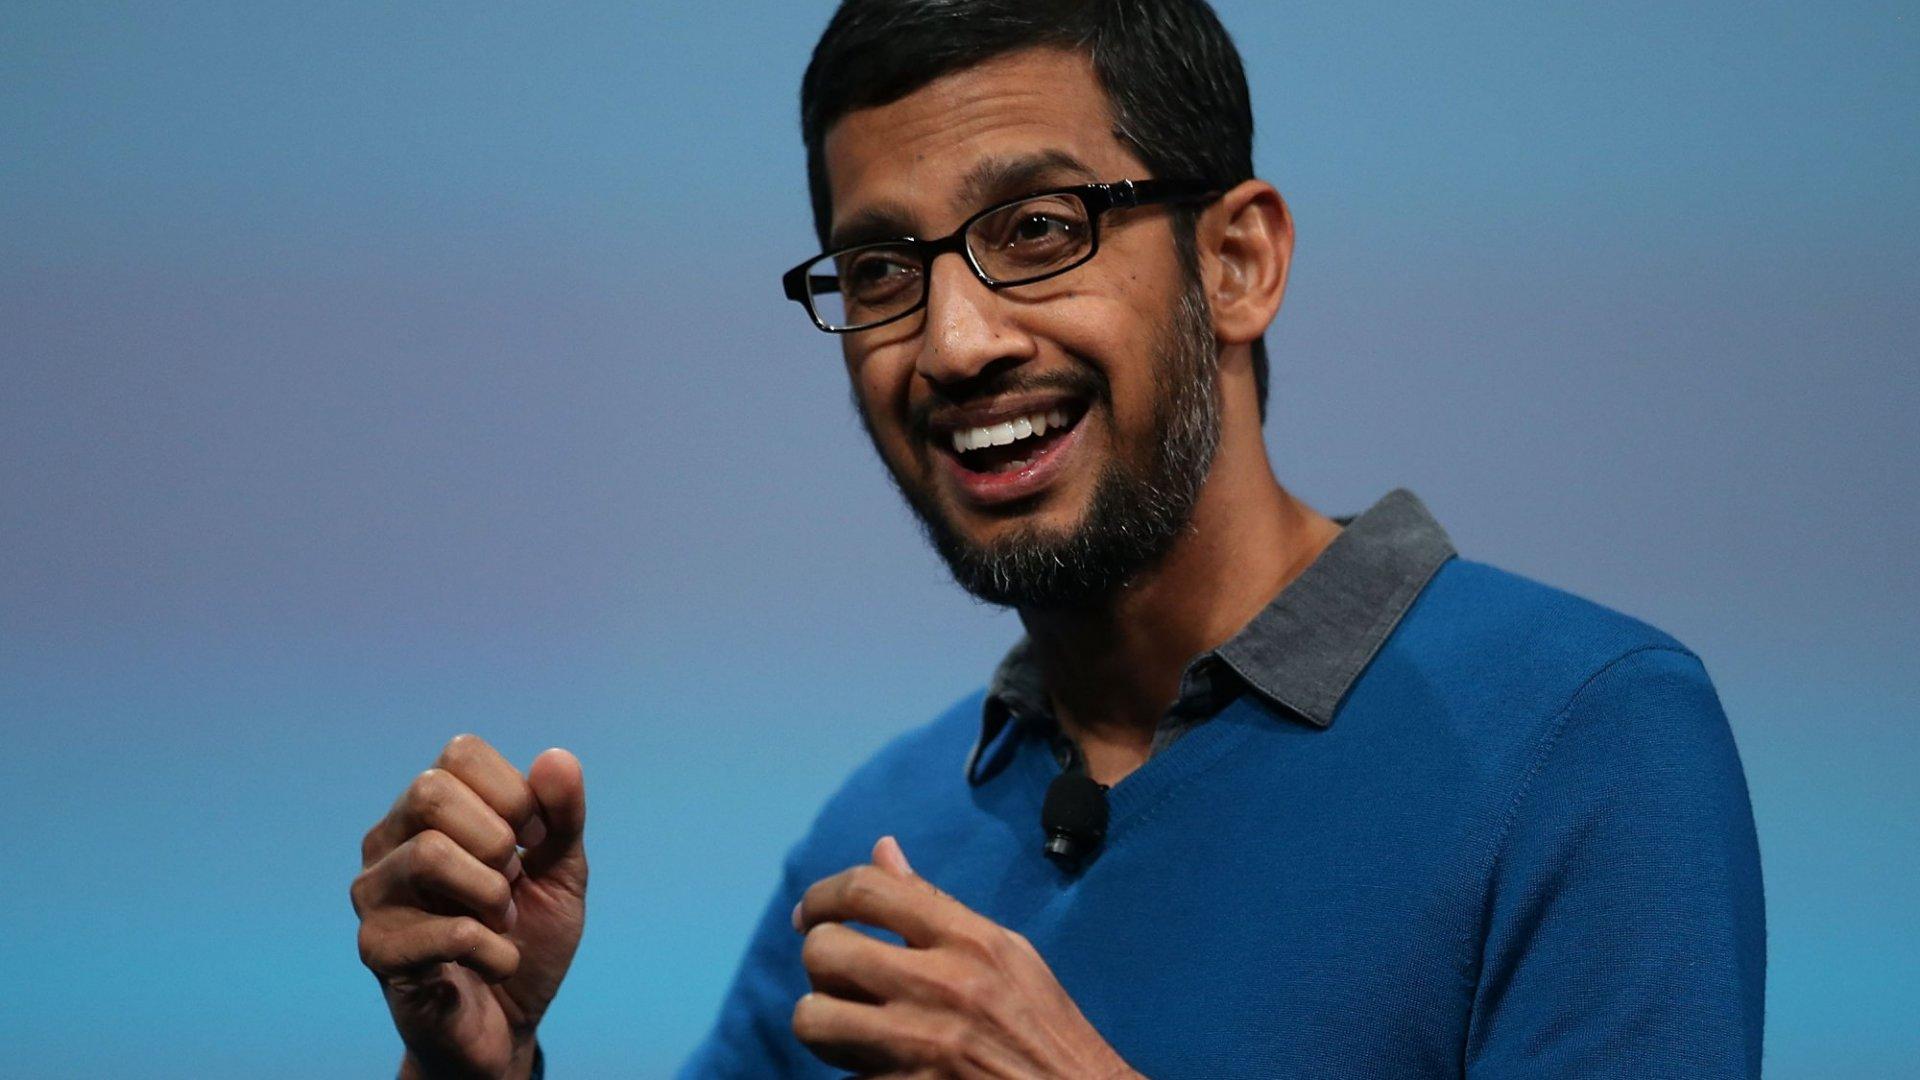 Inside the Daily Routine of Google CEO Sundar Pichai